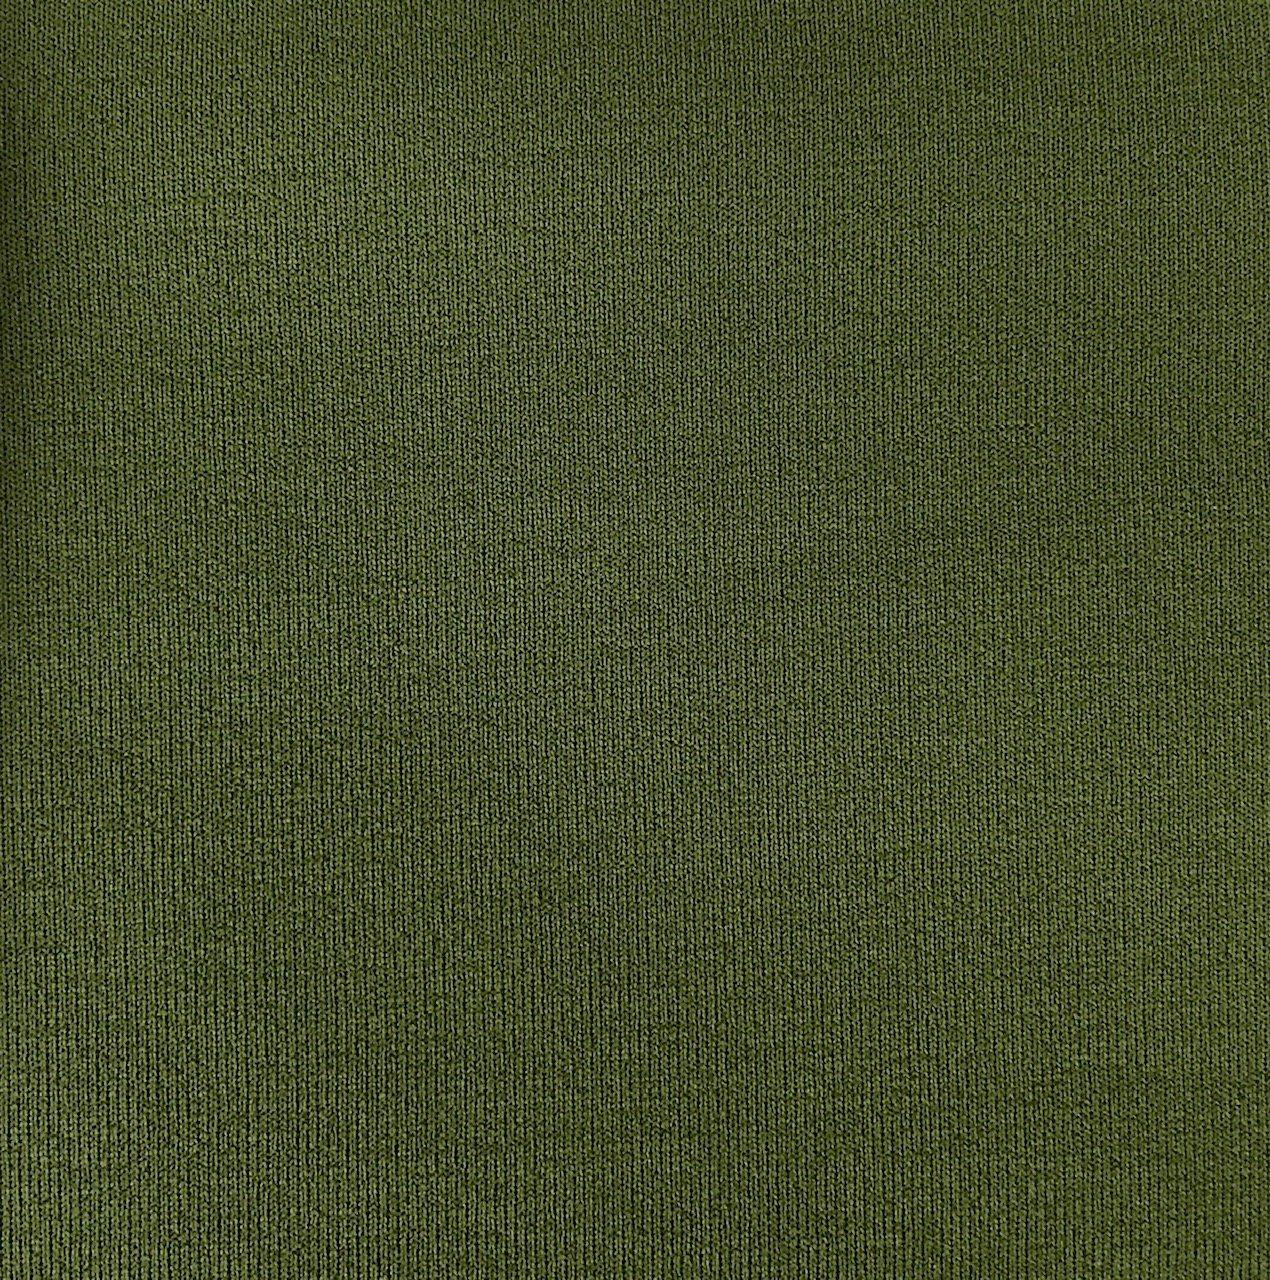 PowerStretch - Artichoke